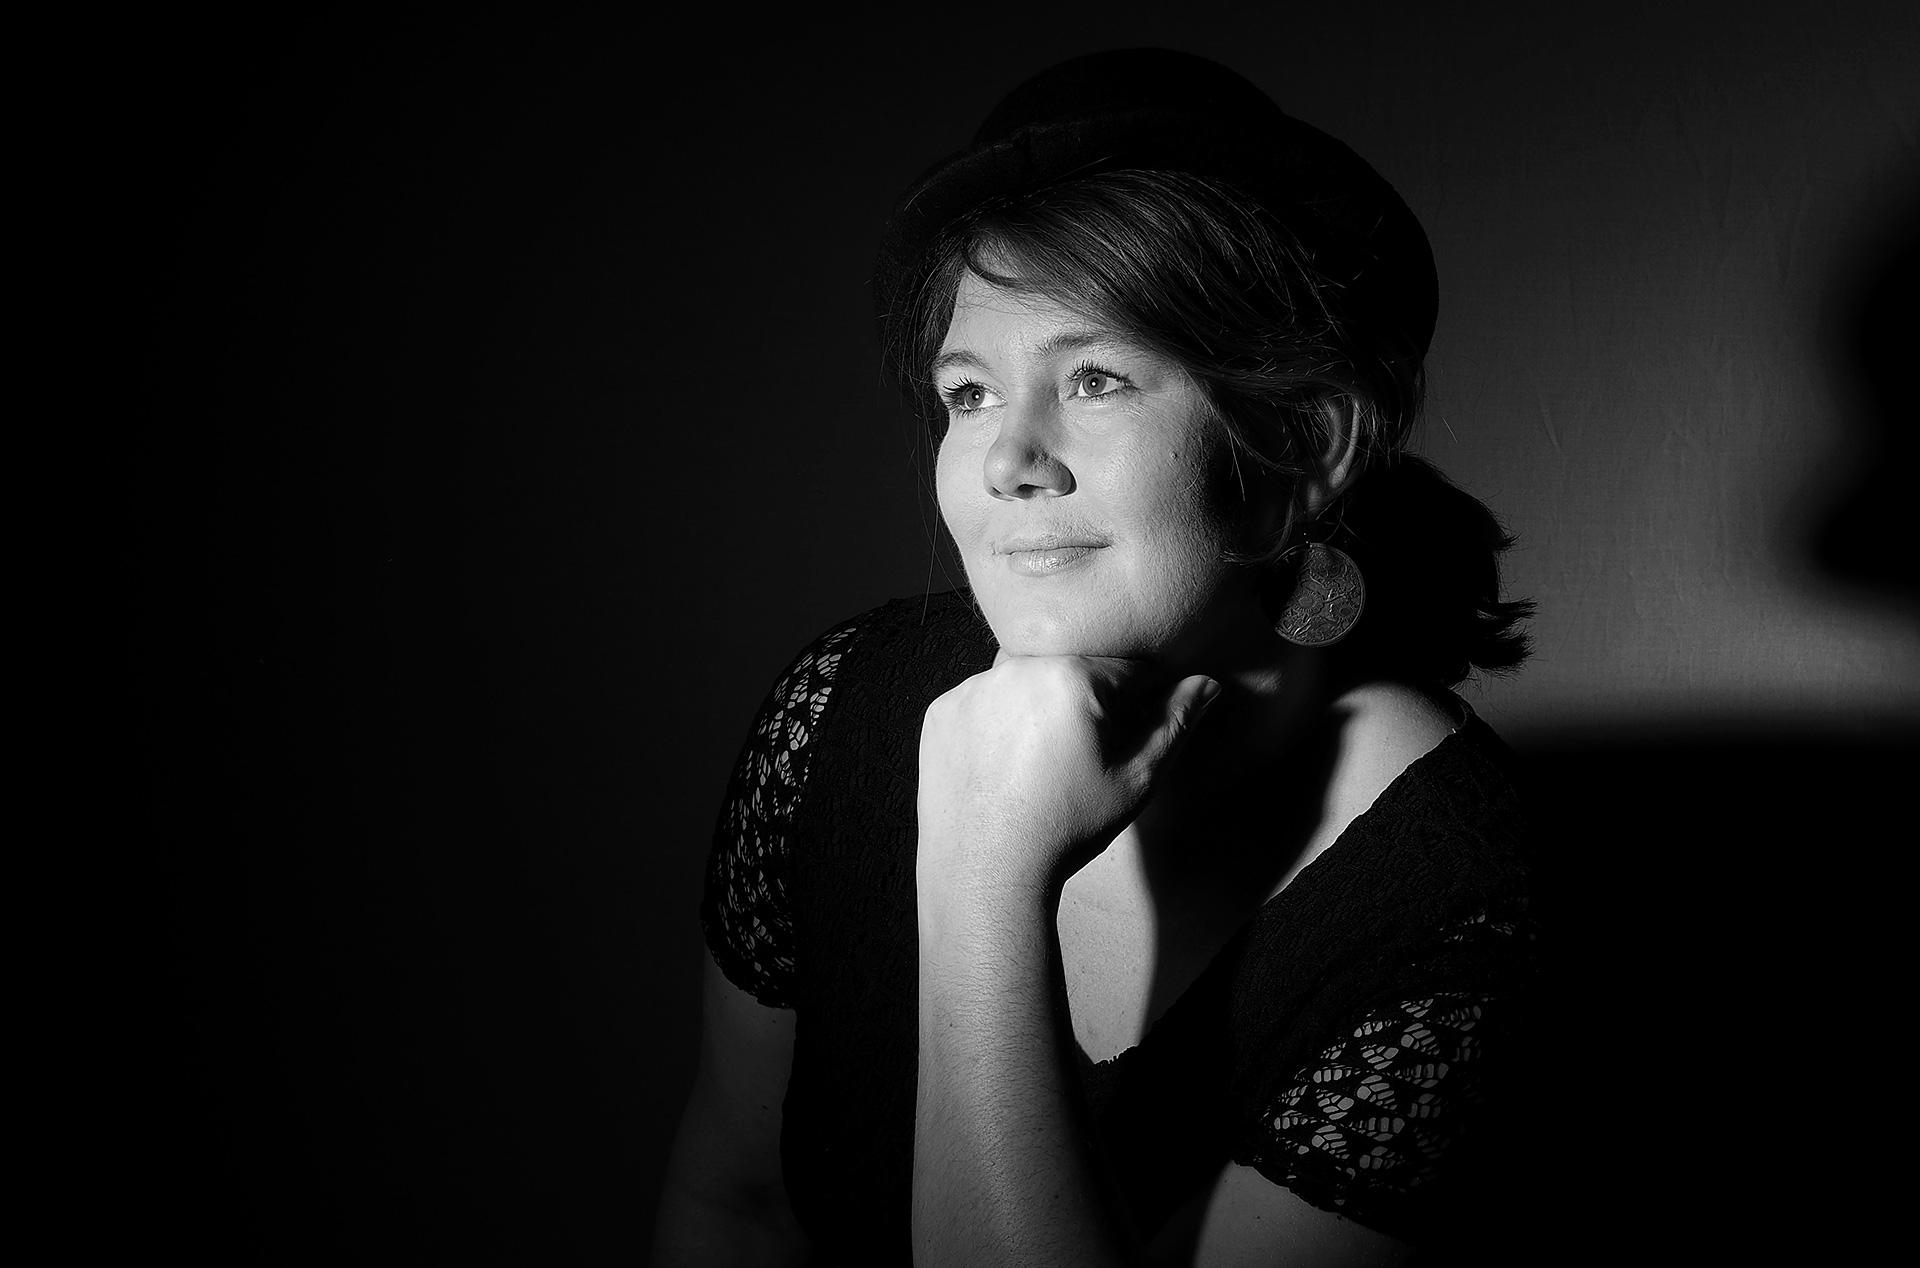 Powlesland Photos Portraits Frauen